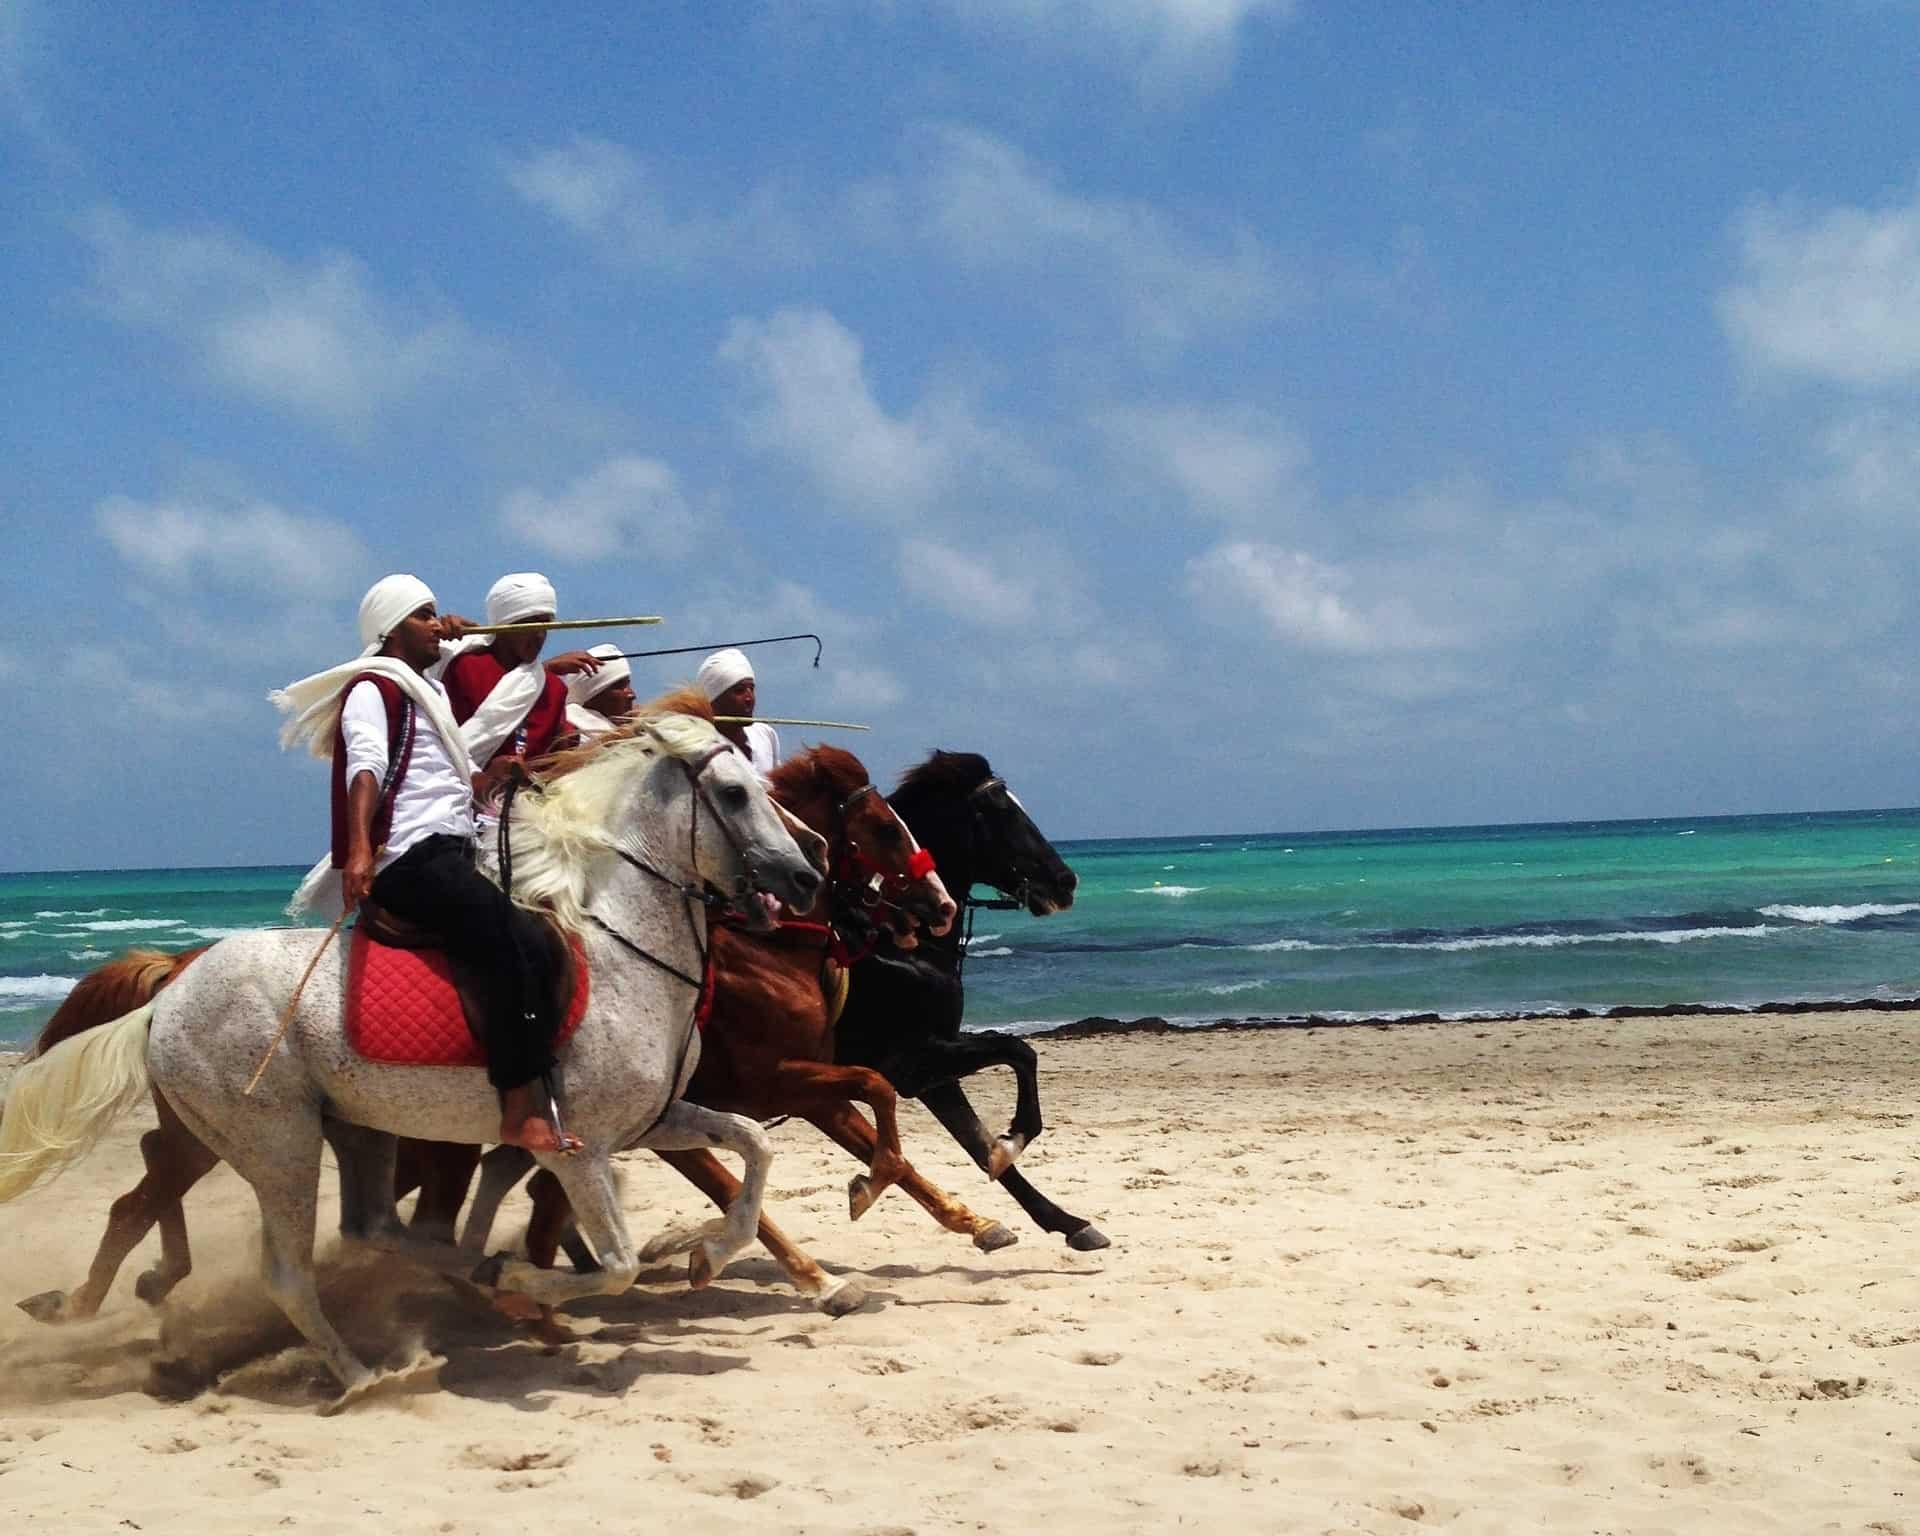 Tunesien - Djerba Urlaub 4 Sterne Hotel Deal